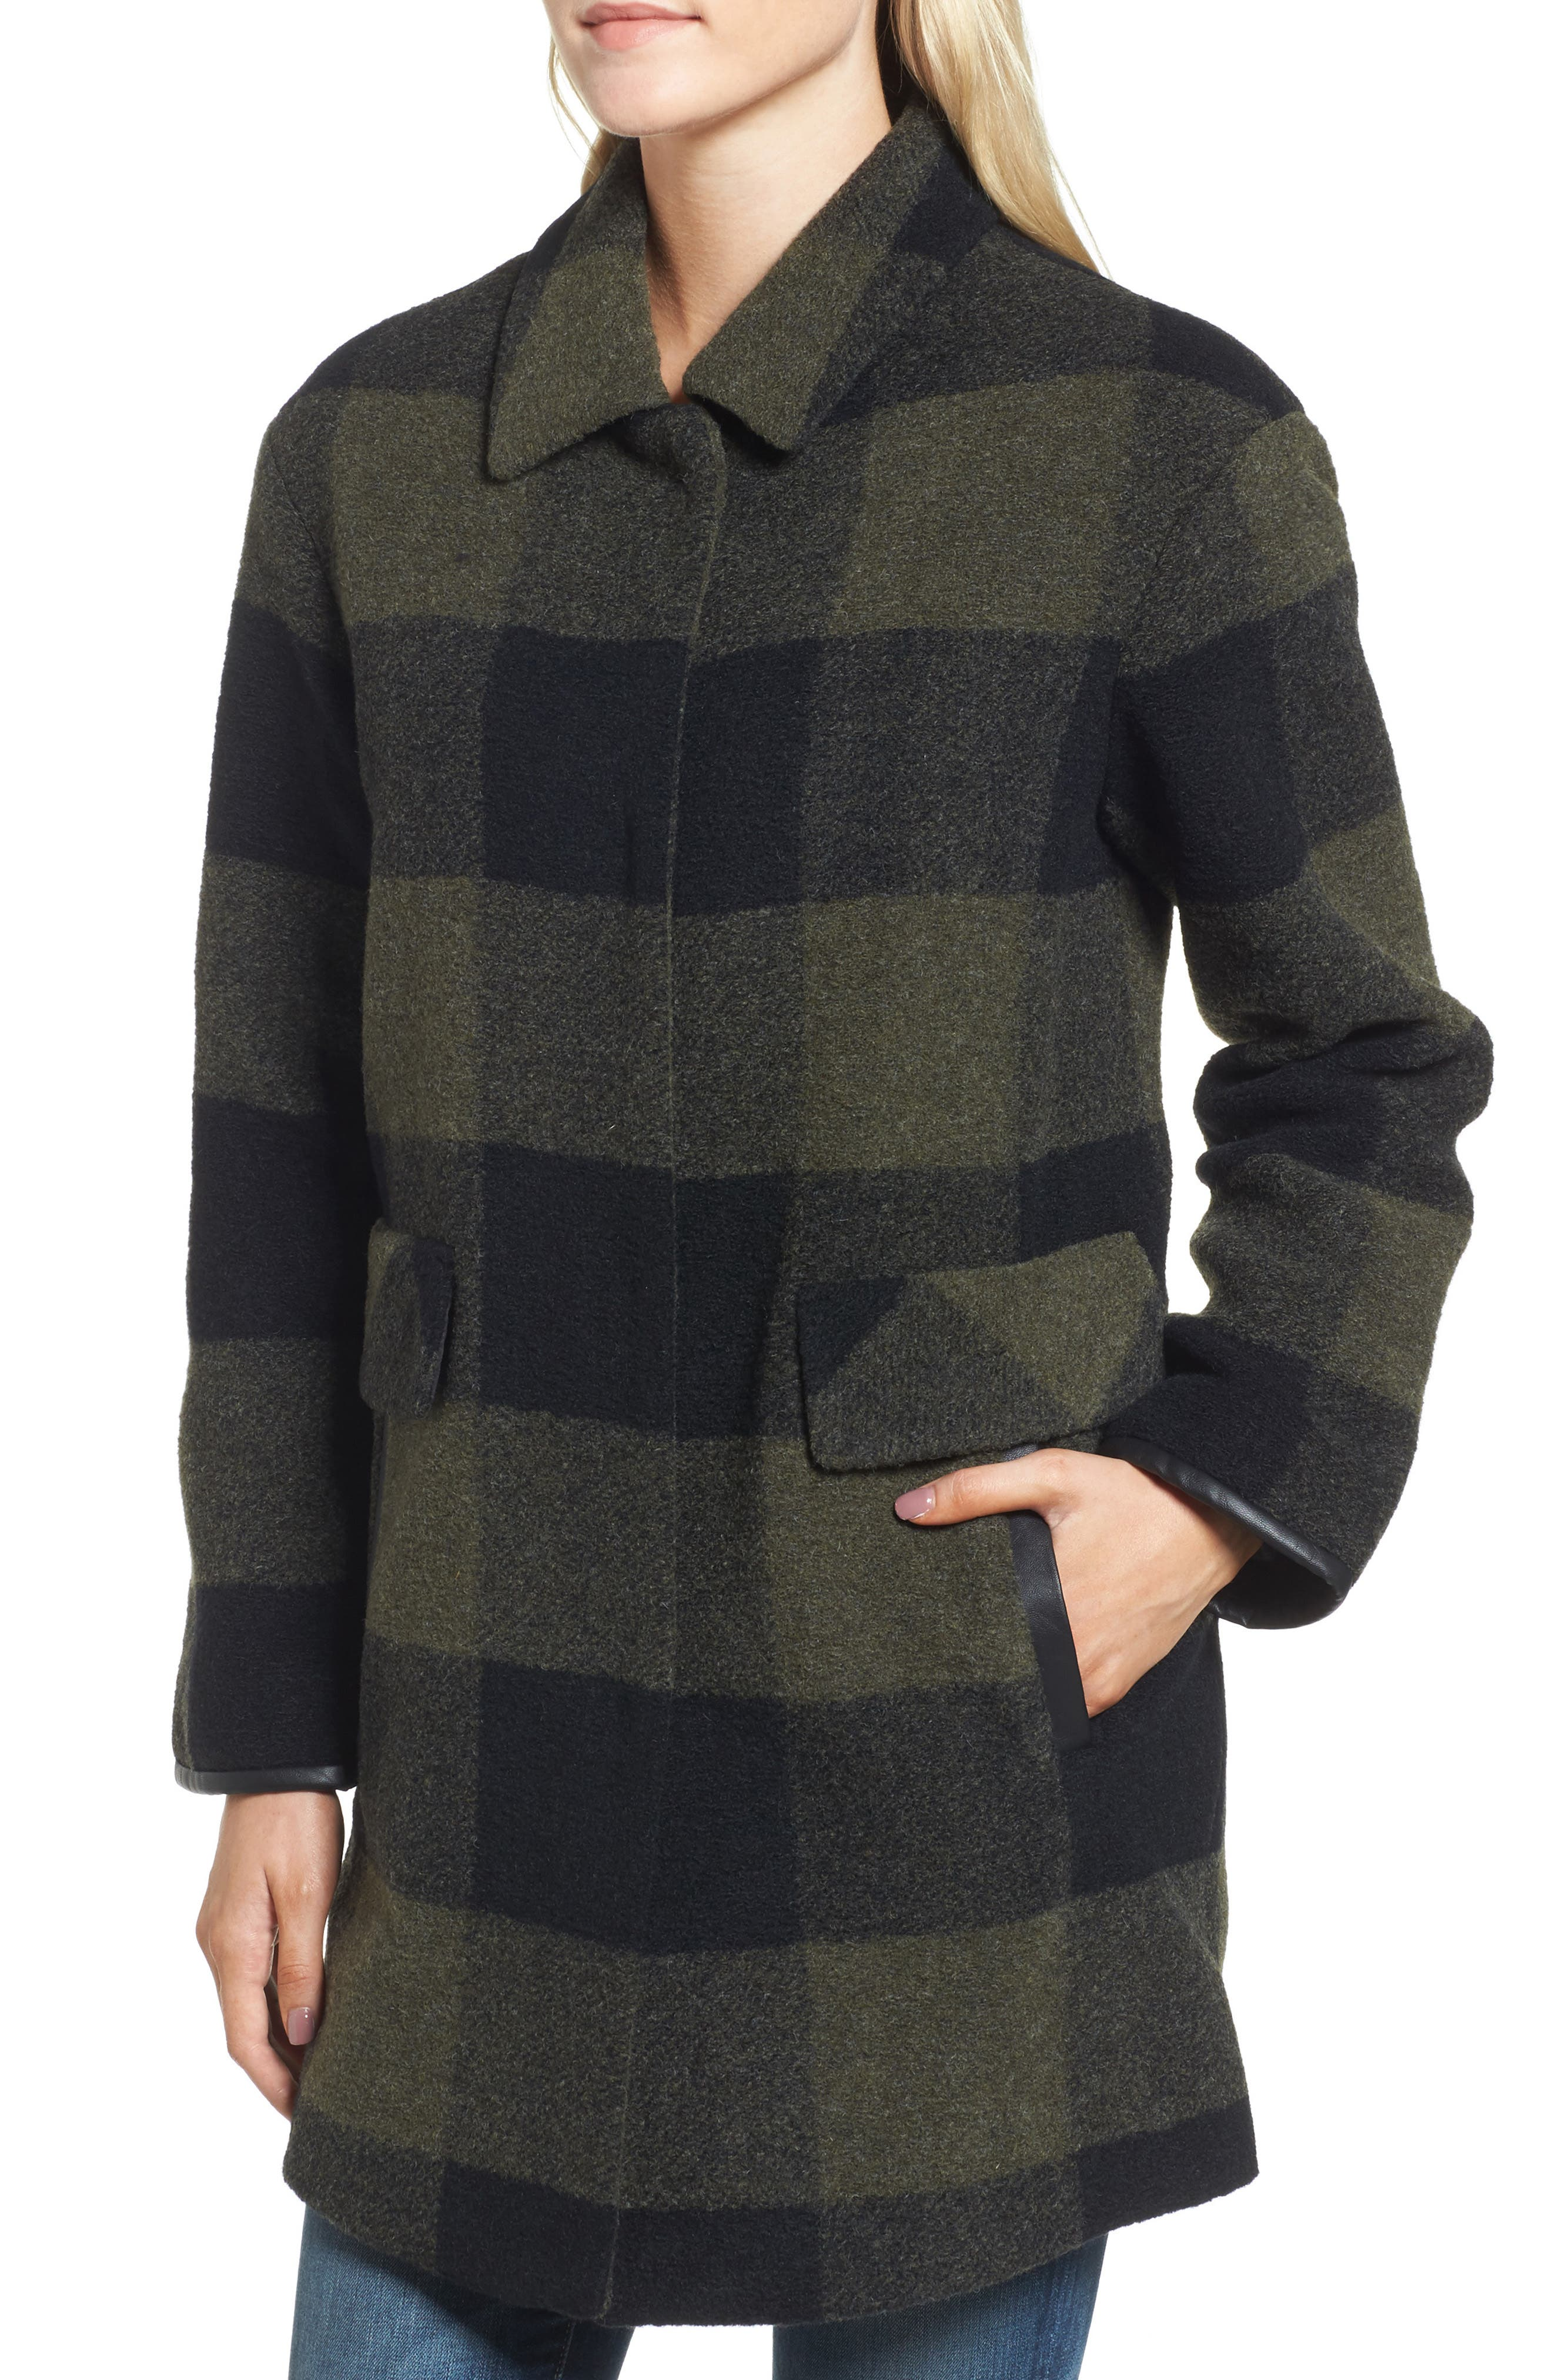 Paul Bunyan Plaid Wool Blend Barn Coat,                             Alternate thumbnail 4, color,                             342